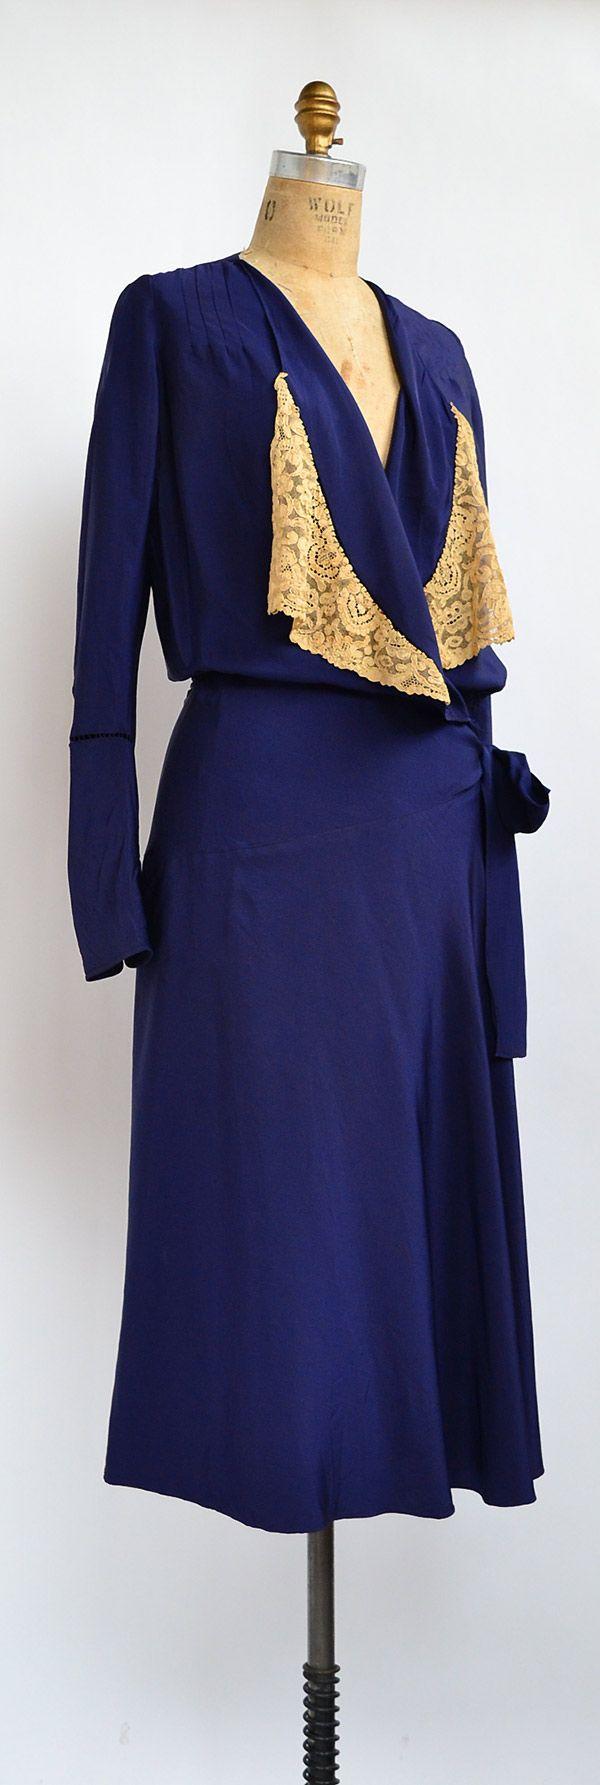 ★ vintage 1930s dress   By Twilight Dress   www.adoredvintage.com